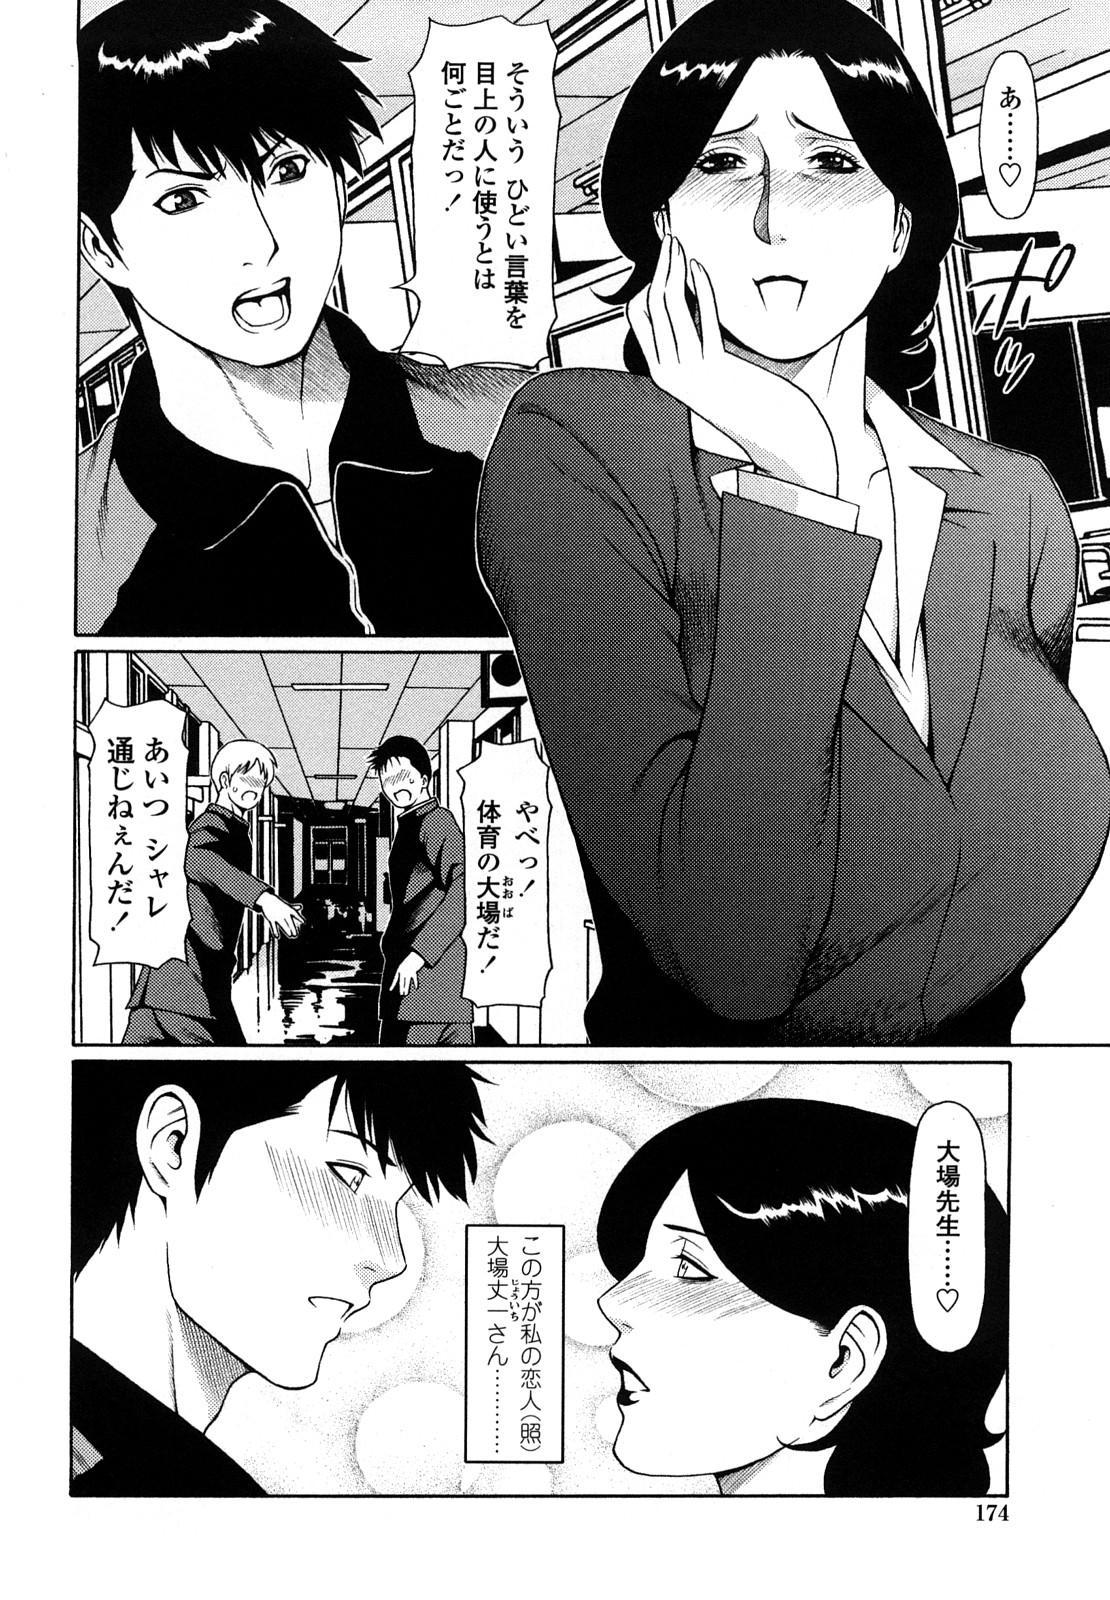 [Takasugi Kou] Kindan no Haha-Ana - Immorality Love-Hole [Decensored] 175